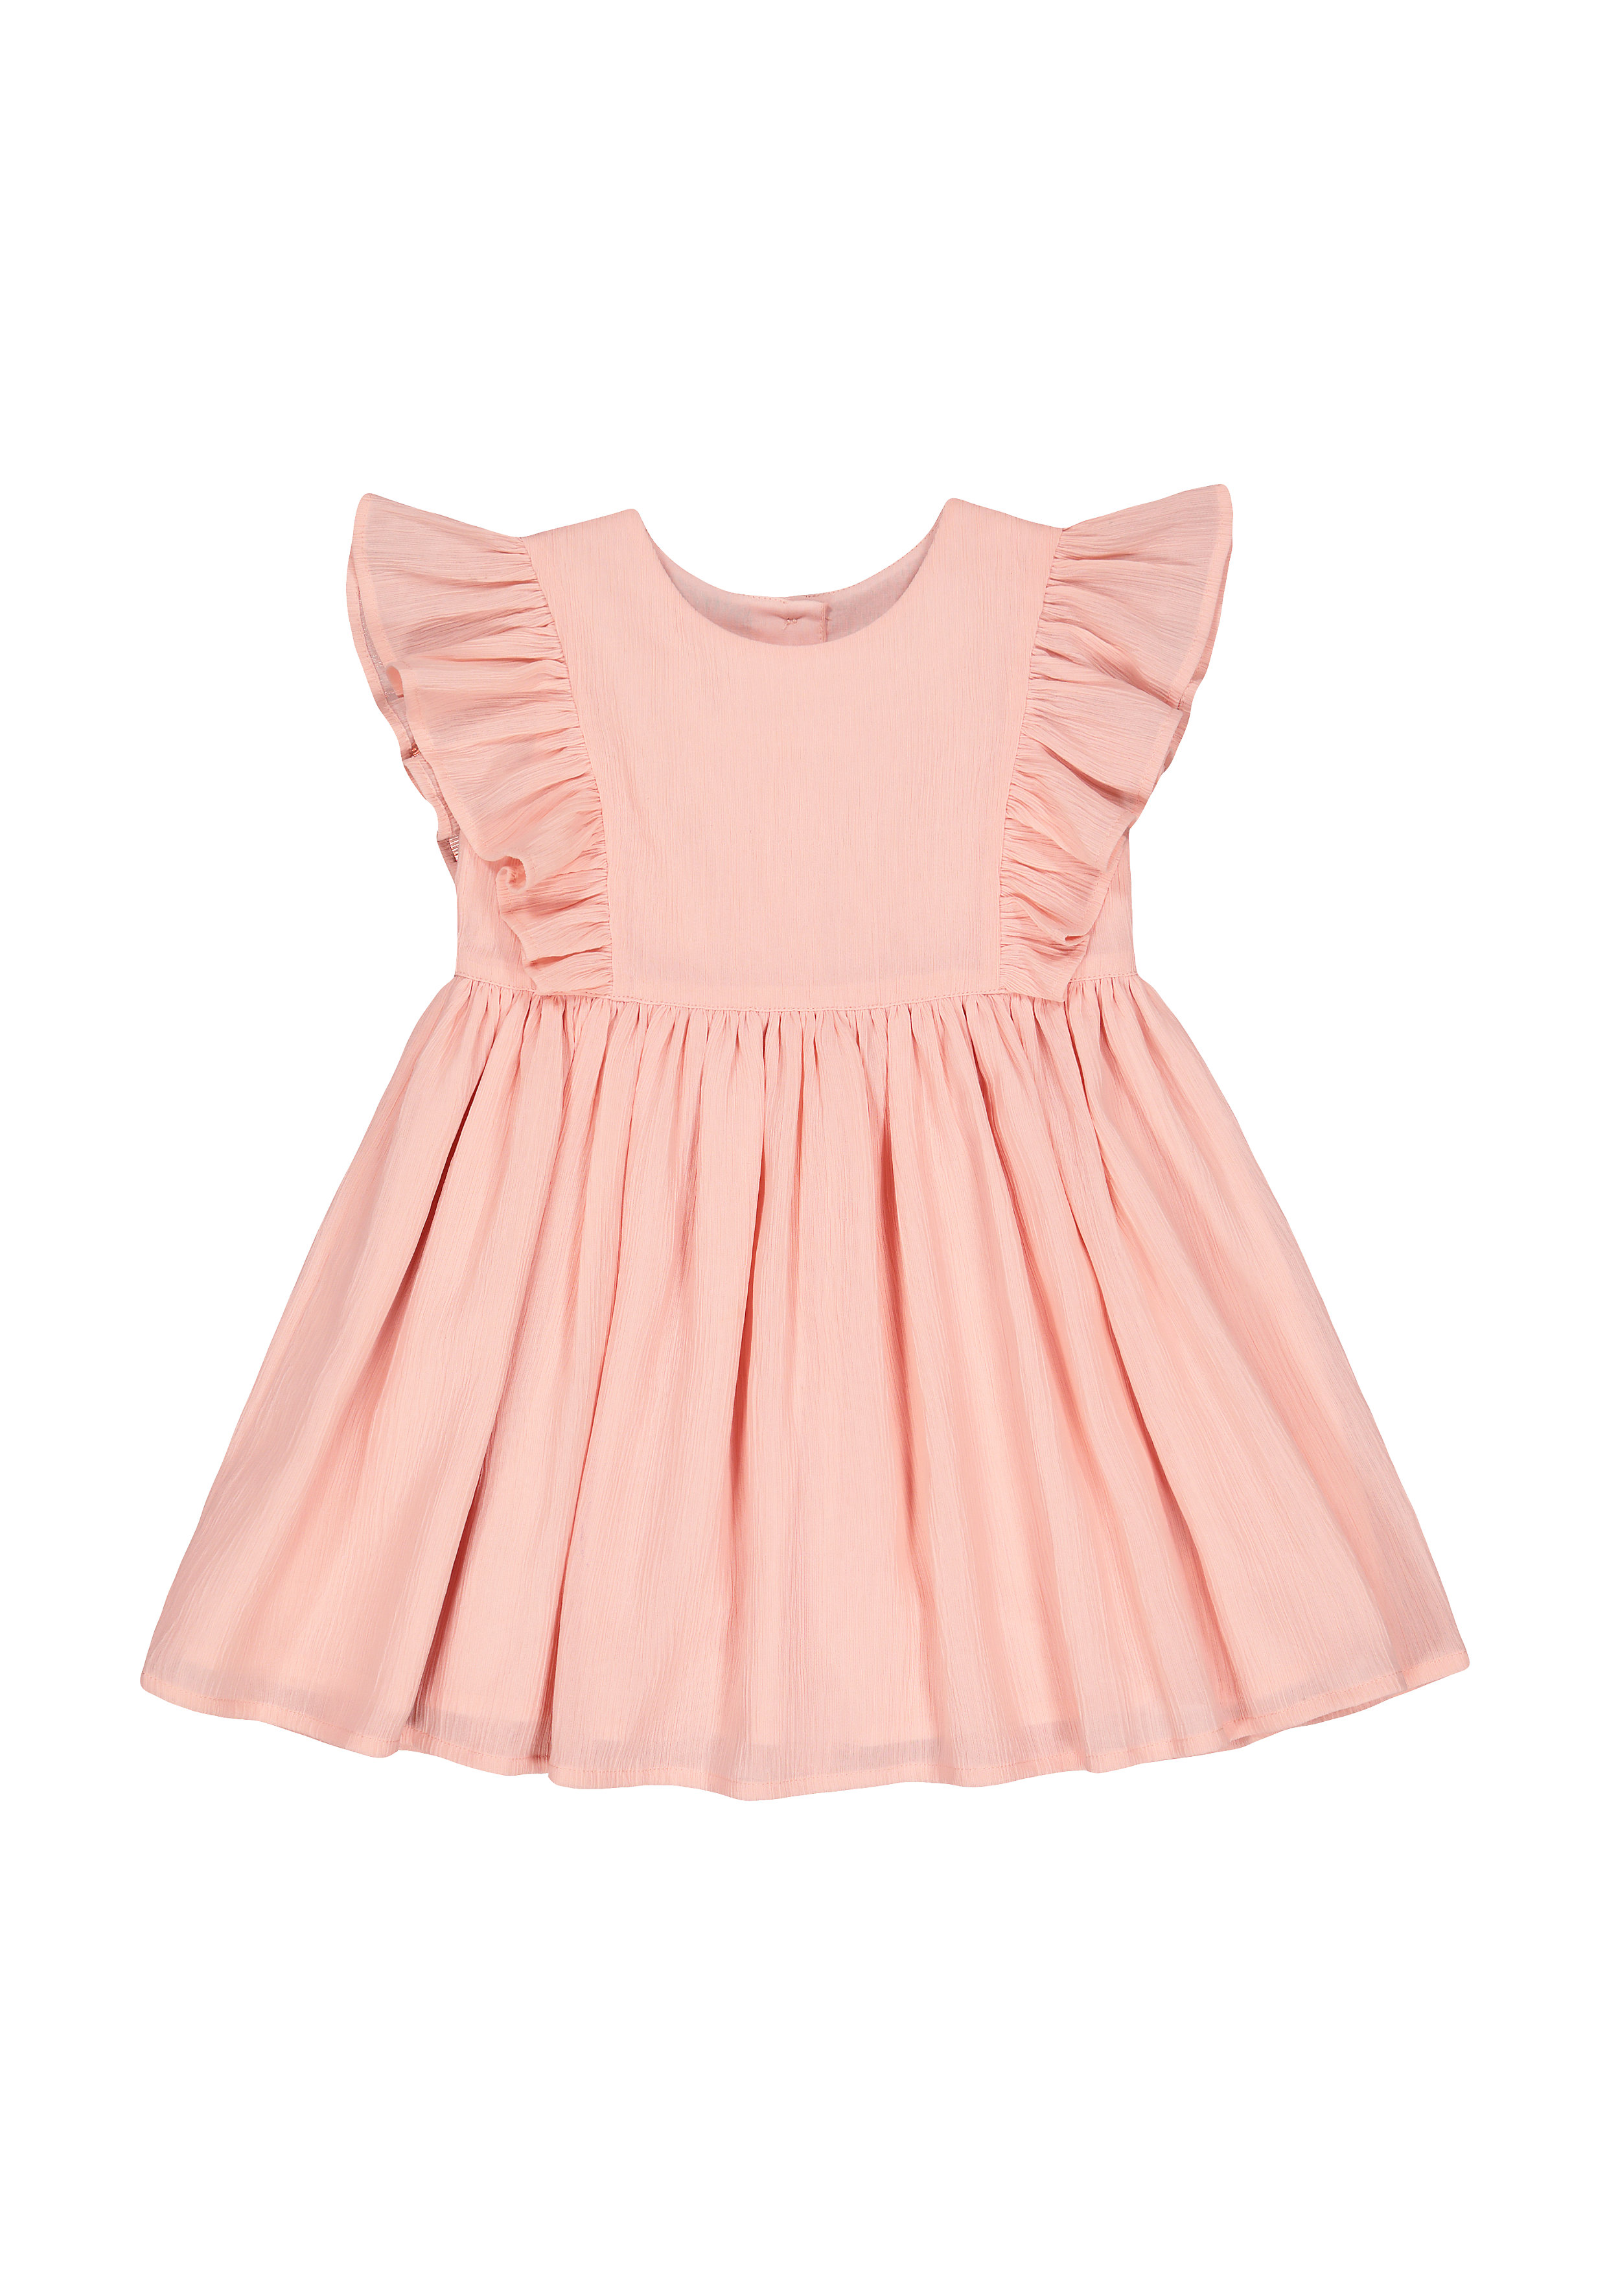 Mothercare | Girls Sleeveless Dress Frill Detail - Pink